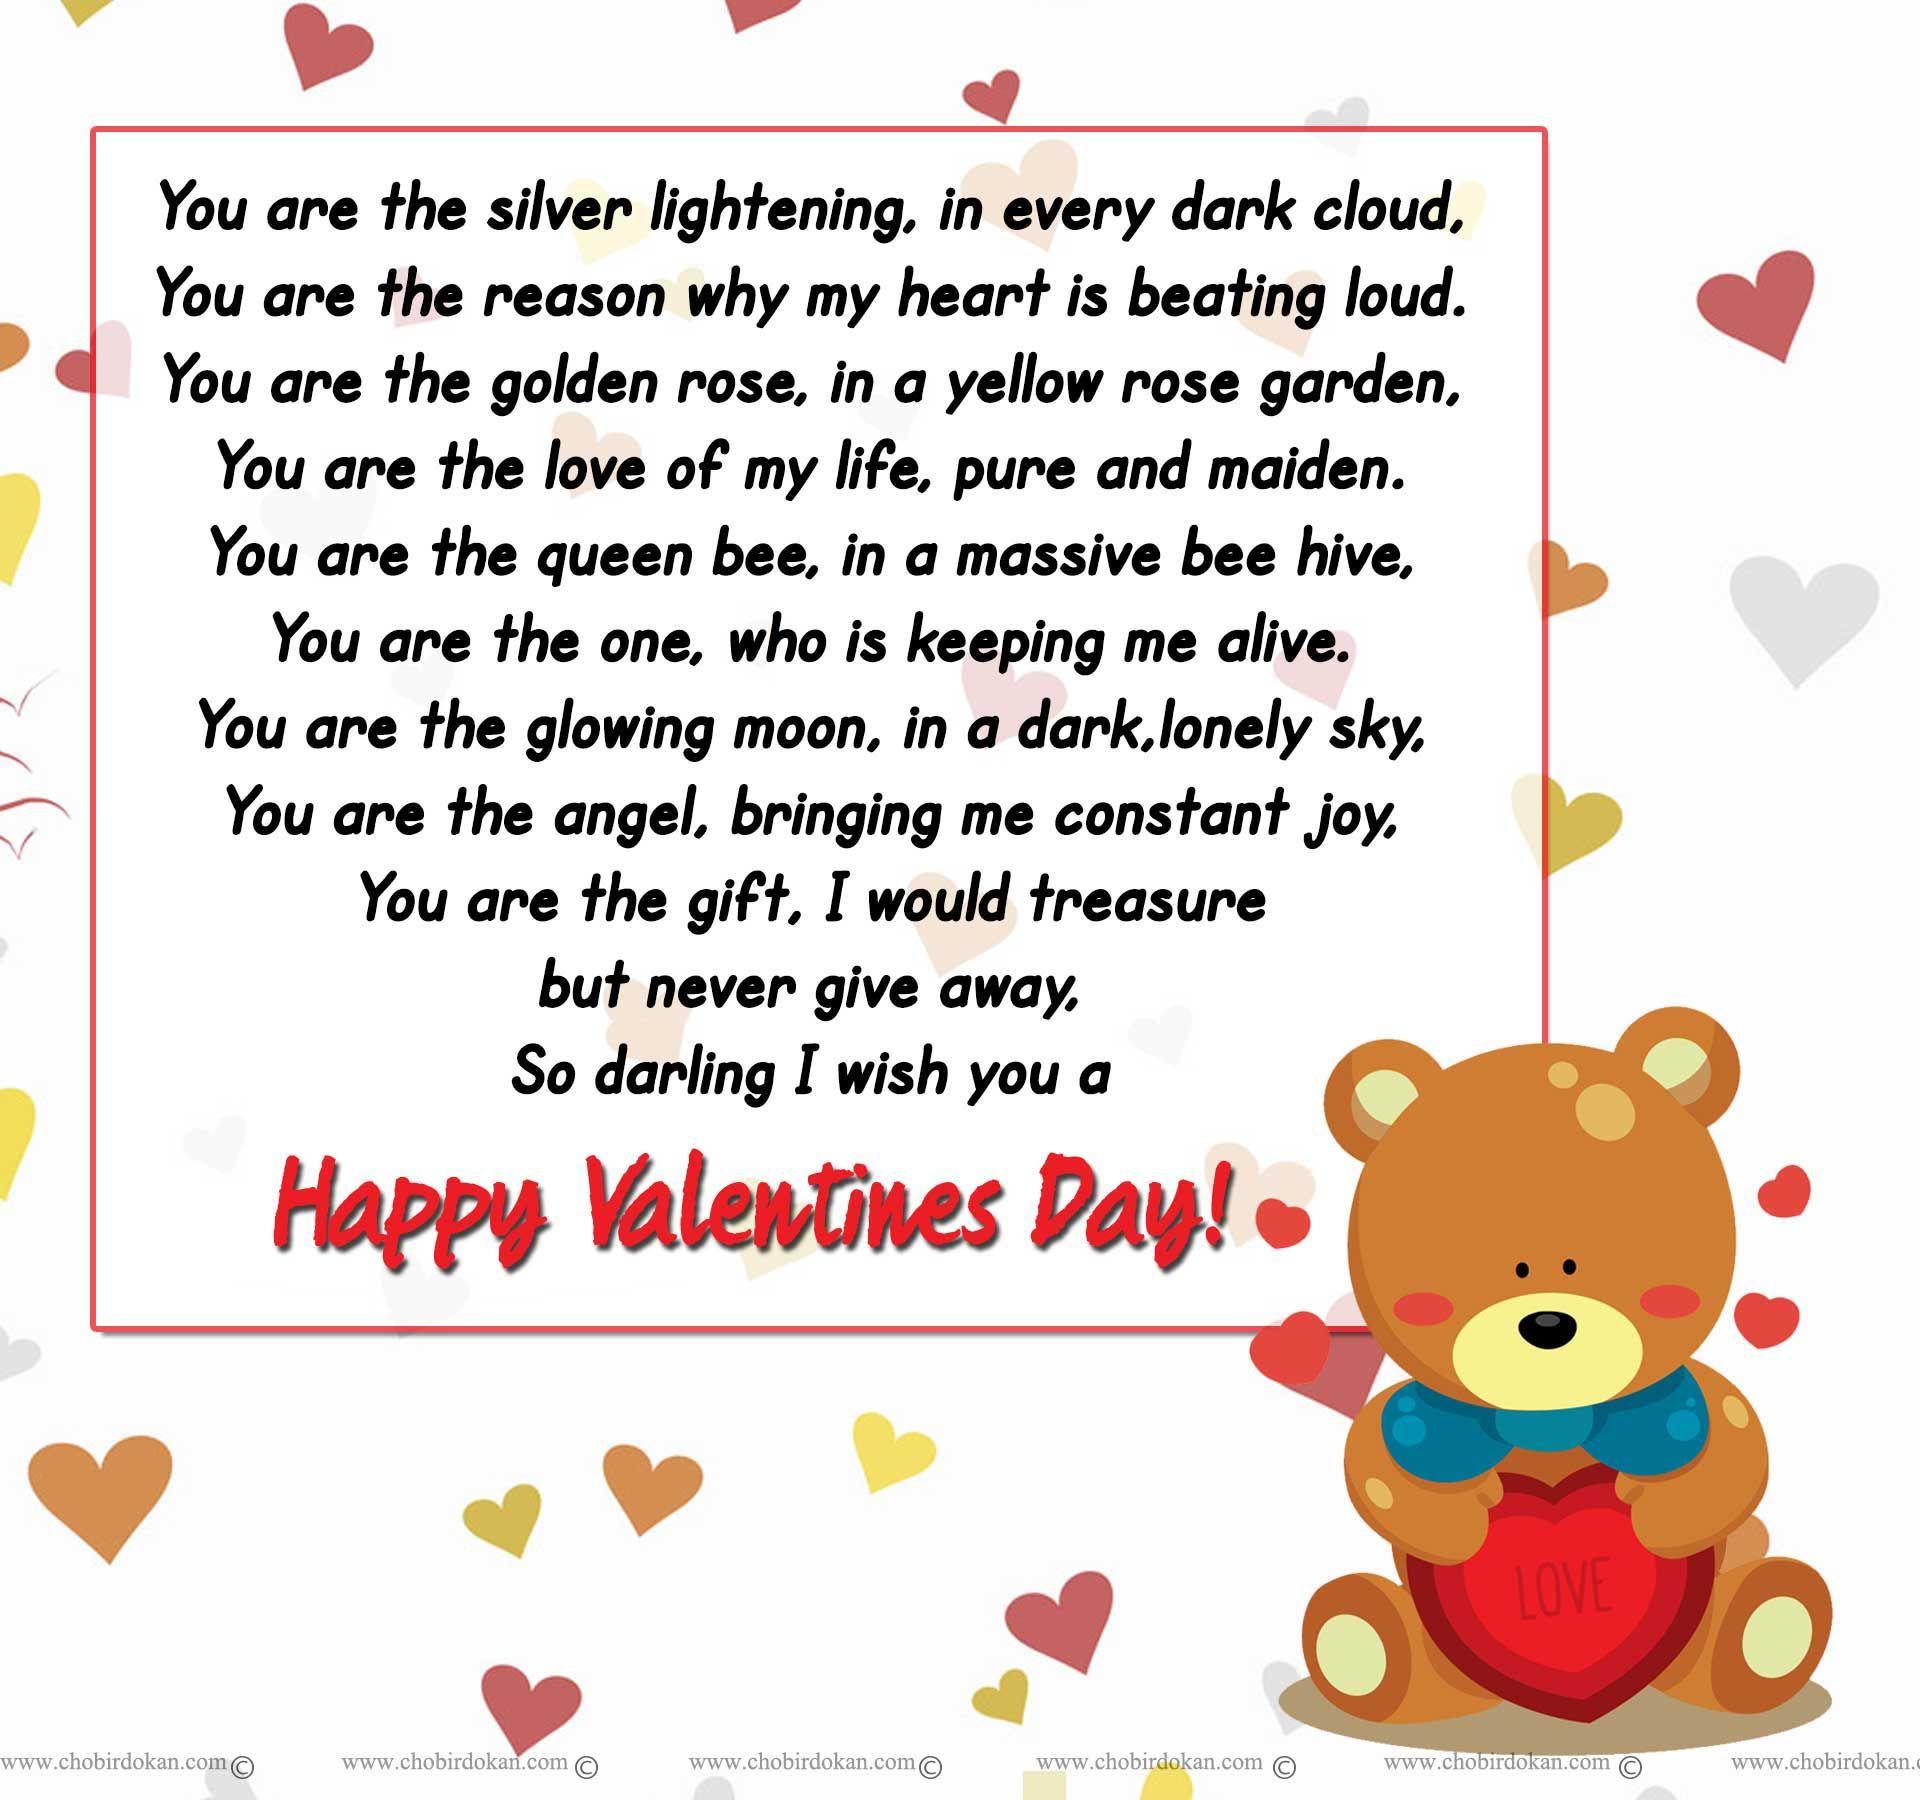 Valentines Poems For Him Love Pinterest – Valentine Card Poems for Him